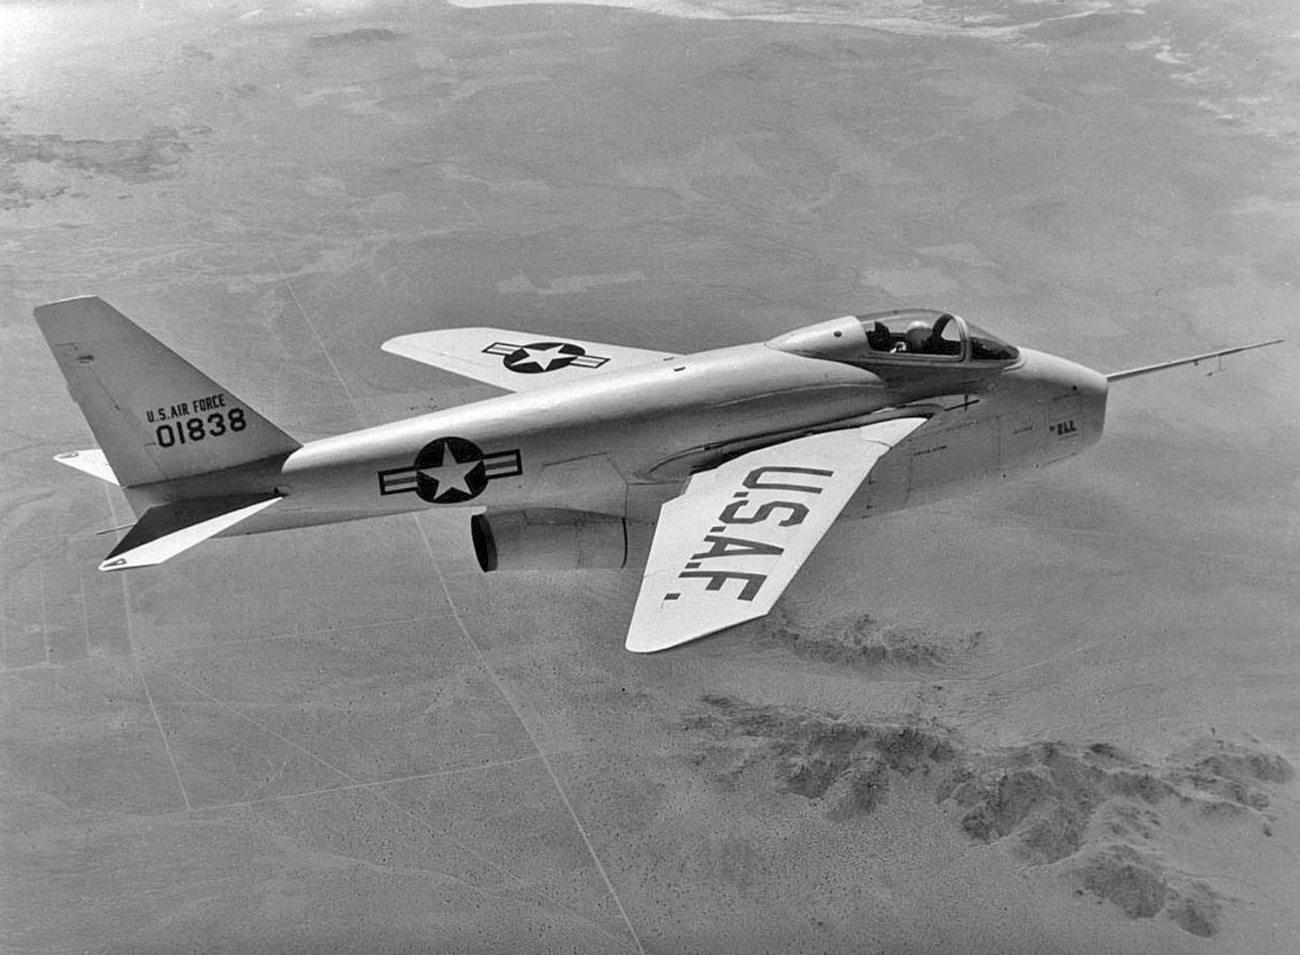 Bell X-5 cruising altitude